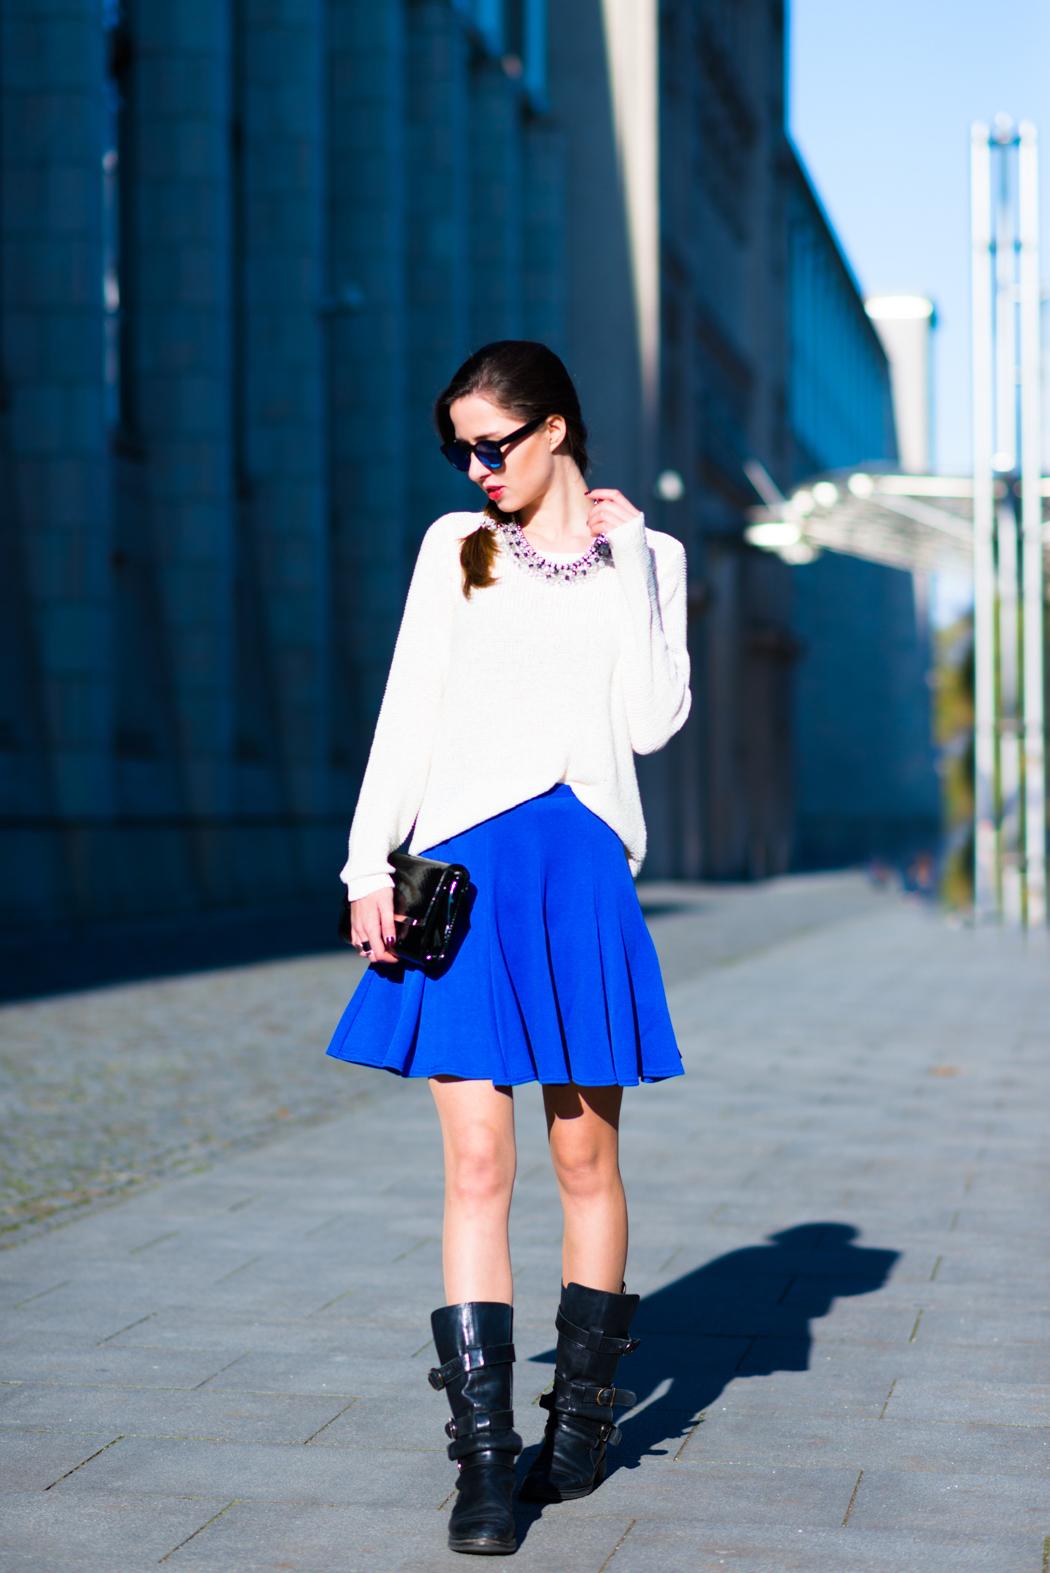 Blue-Skirt-Biker-Boots-Blugirl-Fashionblogger-Deutschland-2